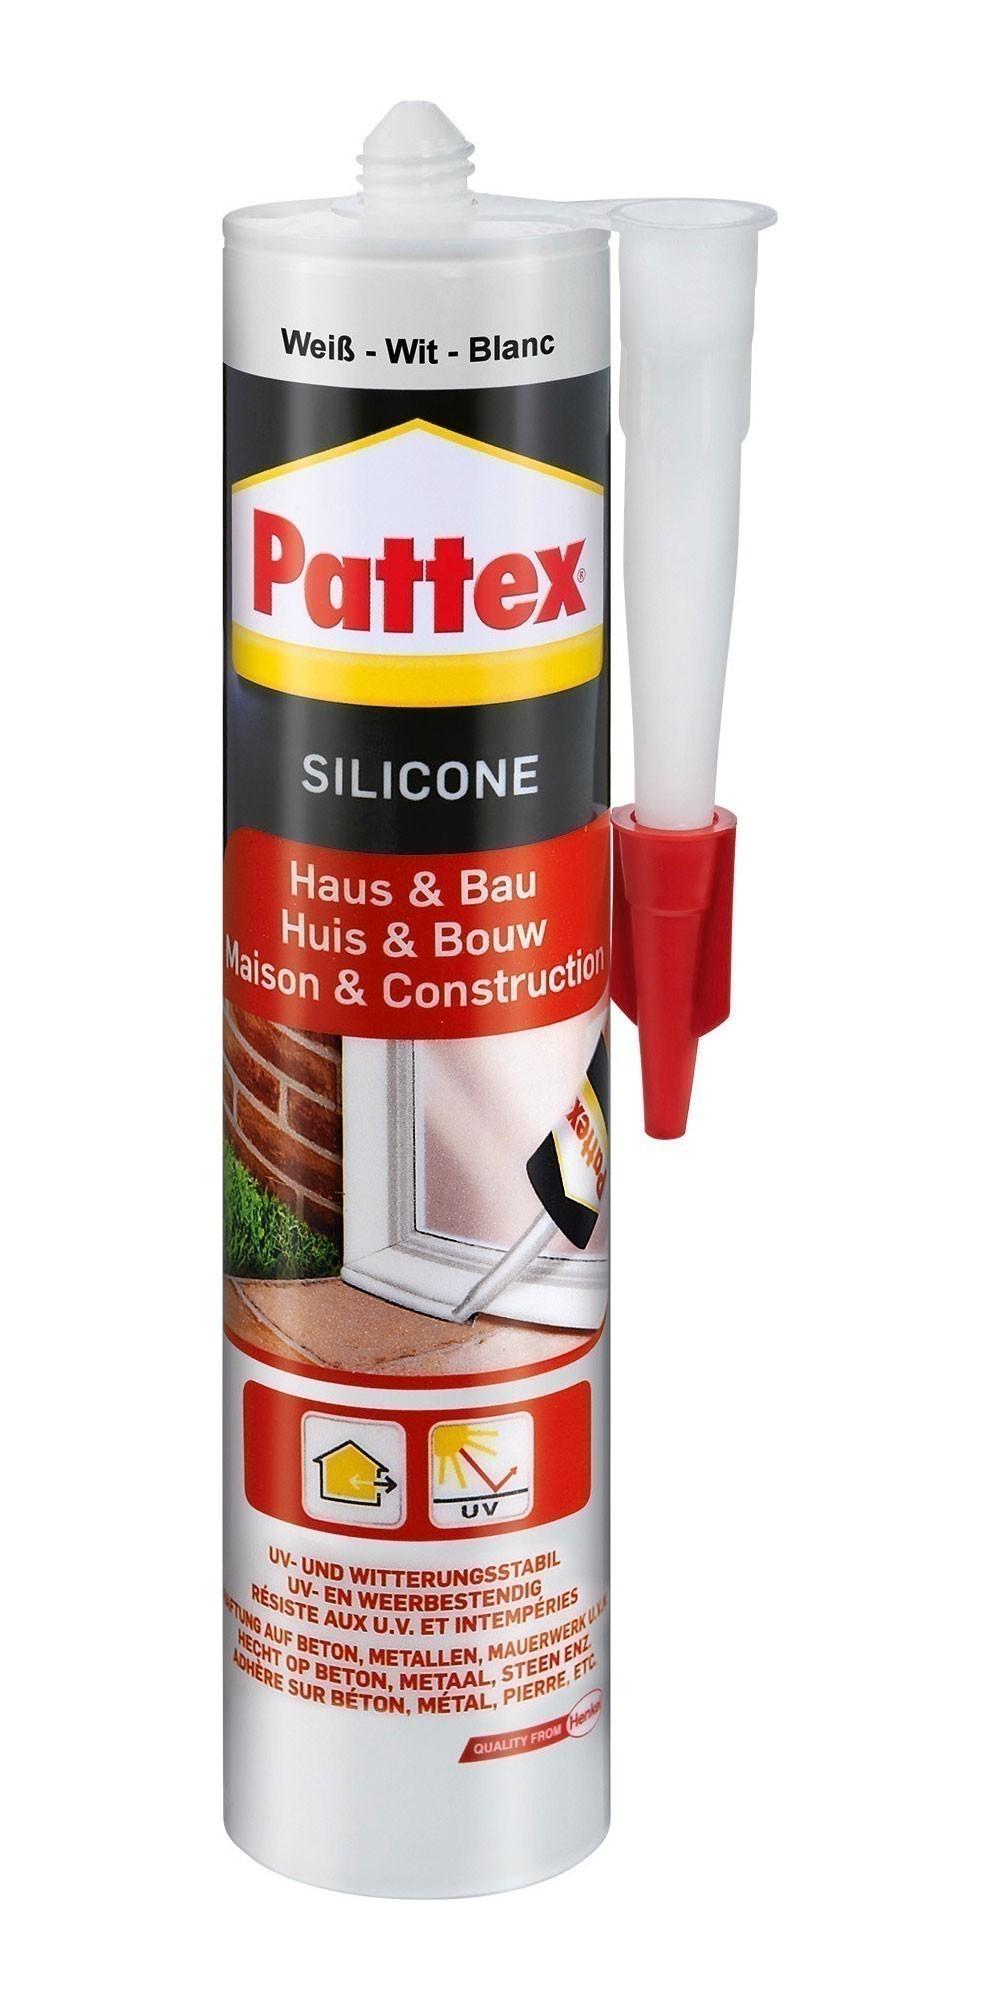 Pattex Haus & Bau Silikon weiß 300ml Bild 1